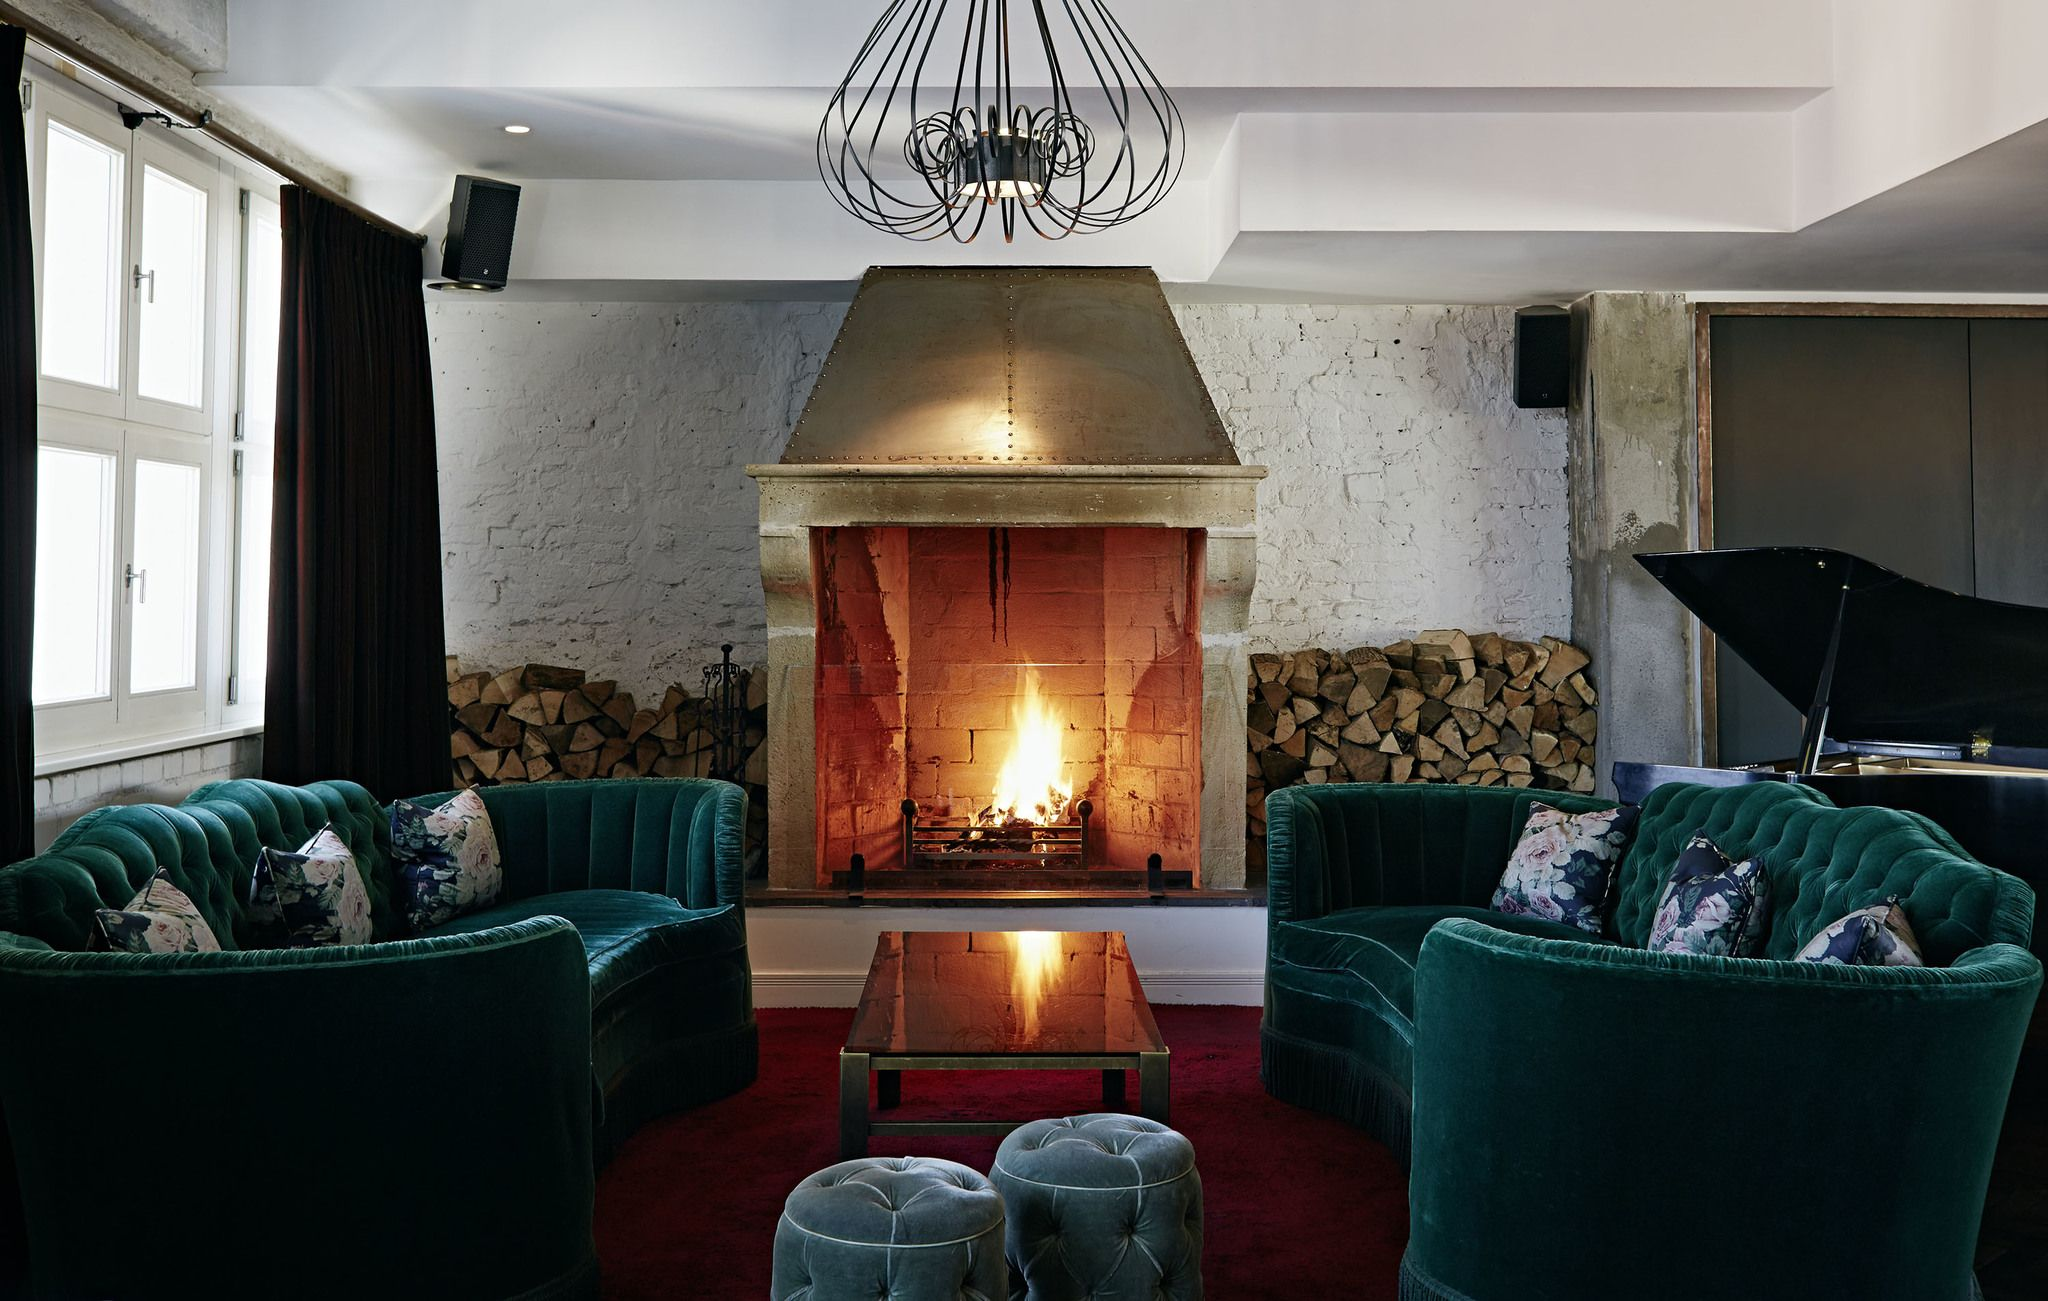 Soho House / Berlin - the firepiece | Interior ...